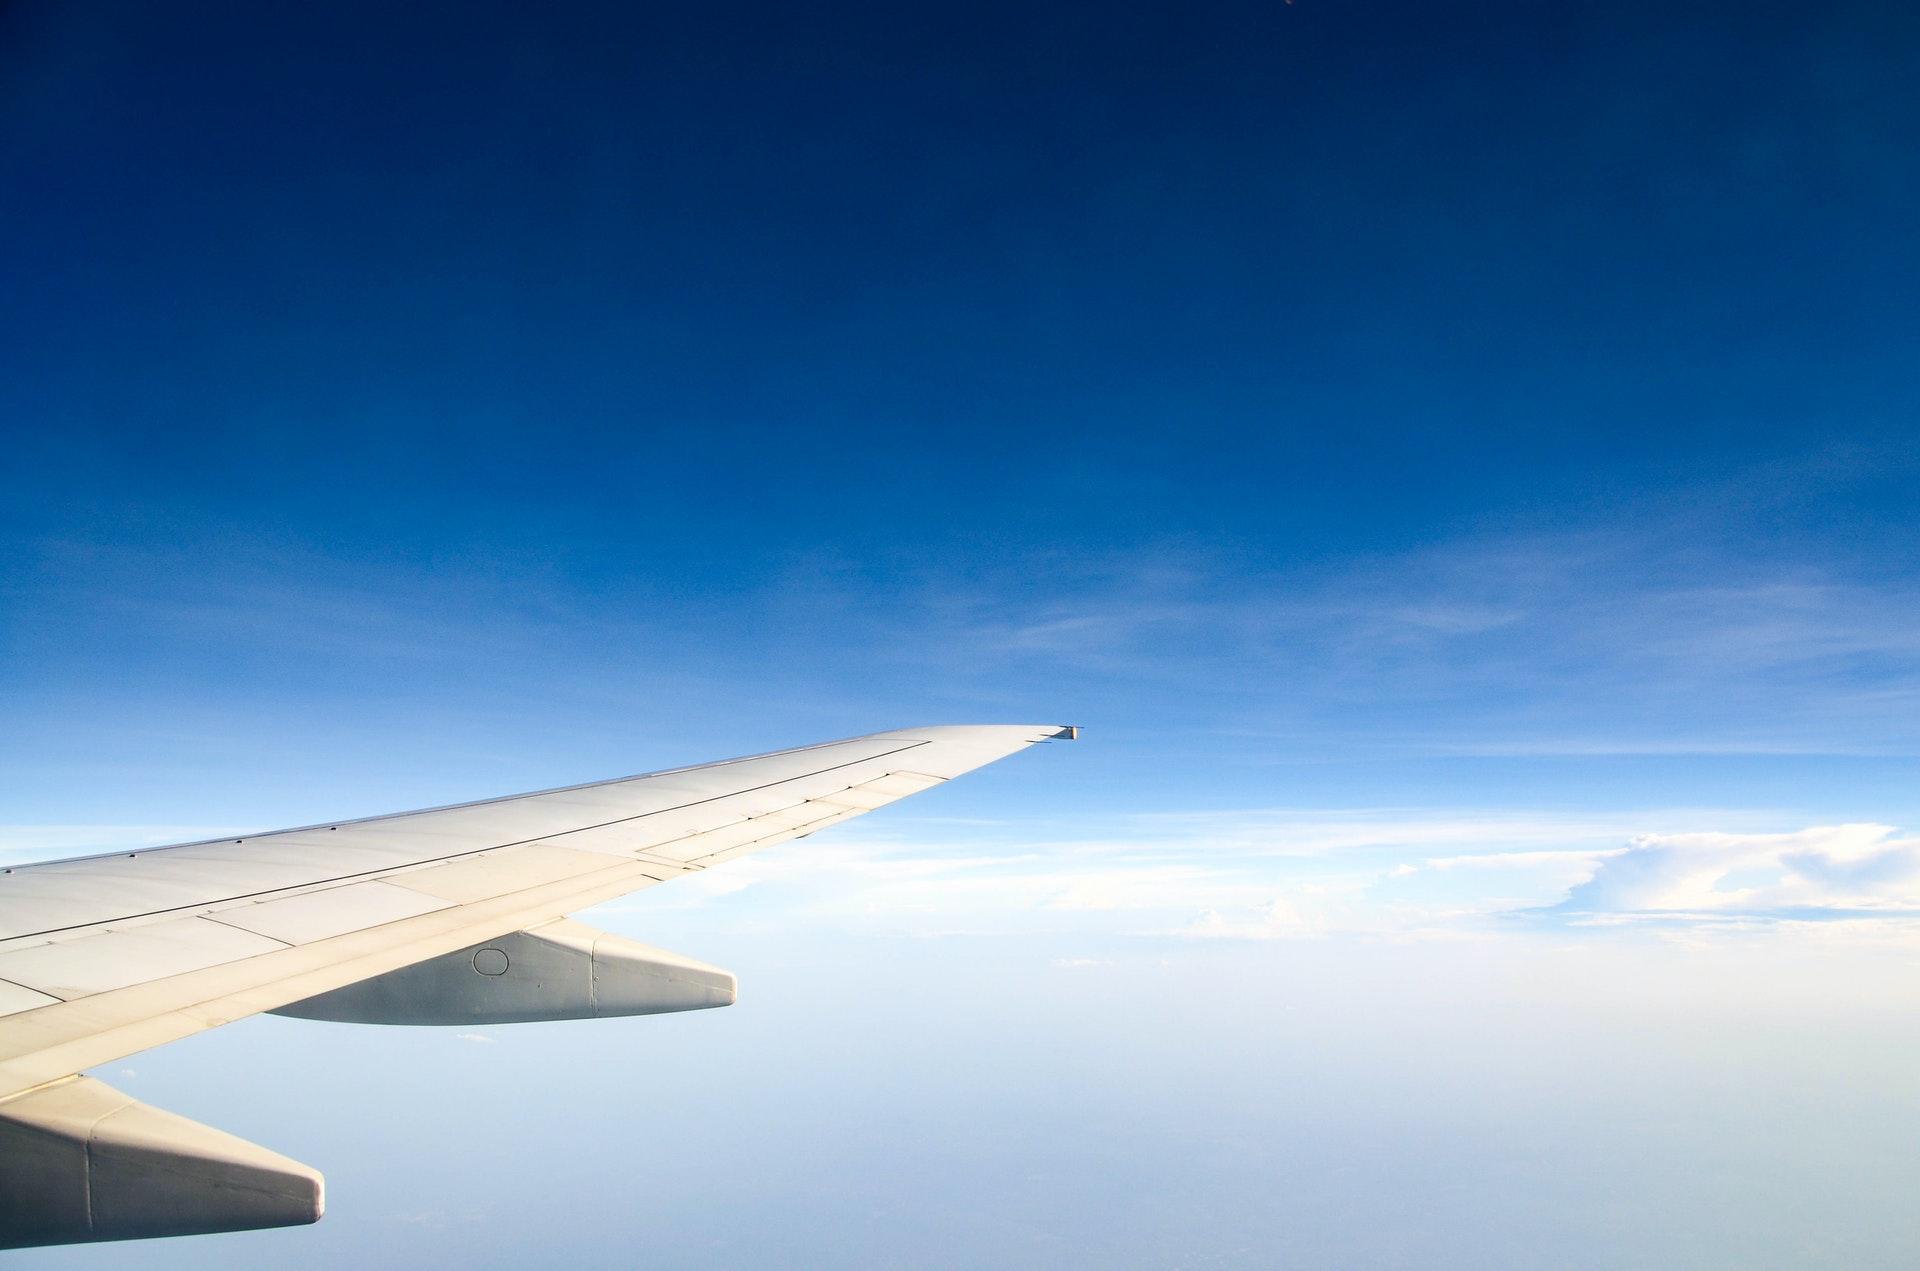 Air Serbia chooses SkyBreathe®